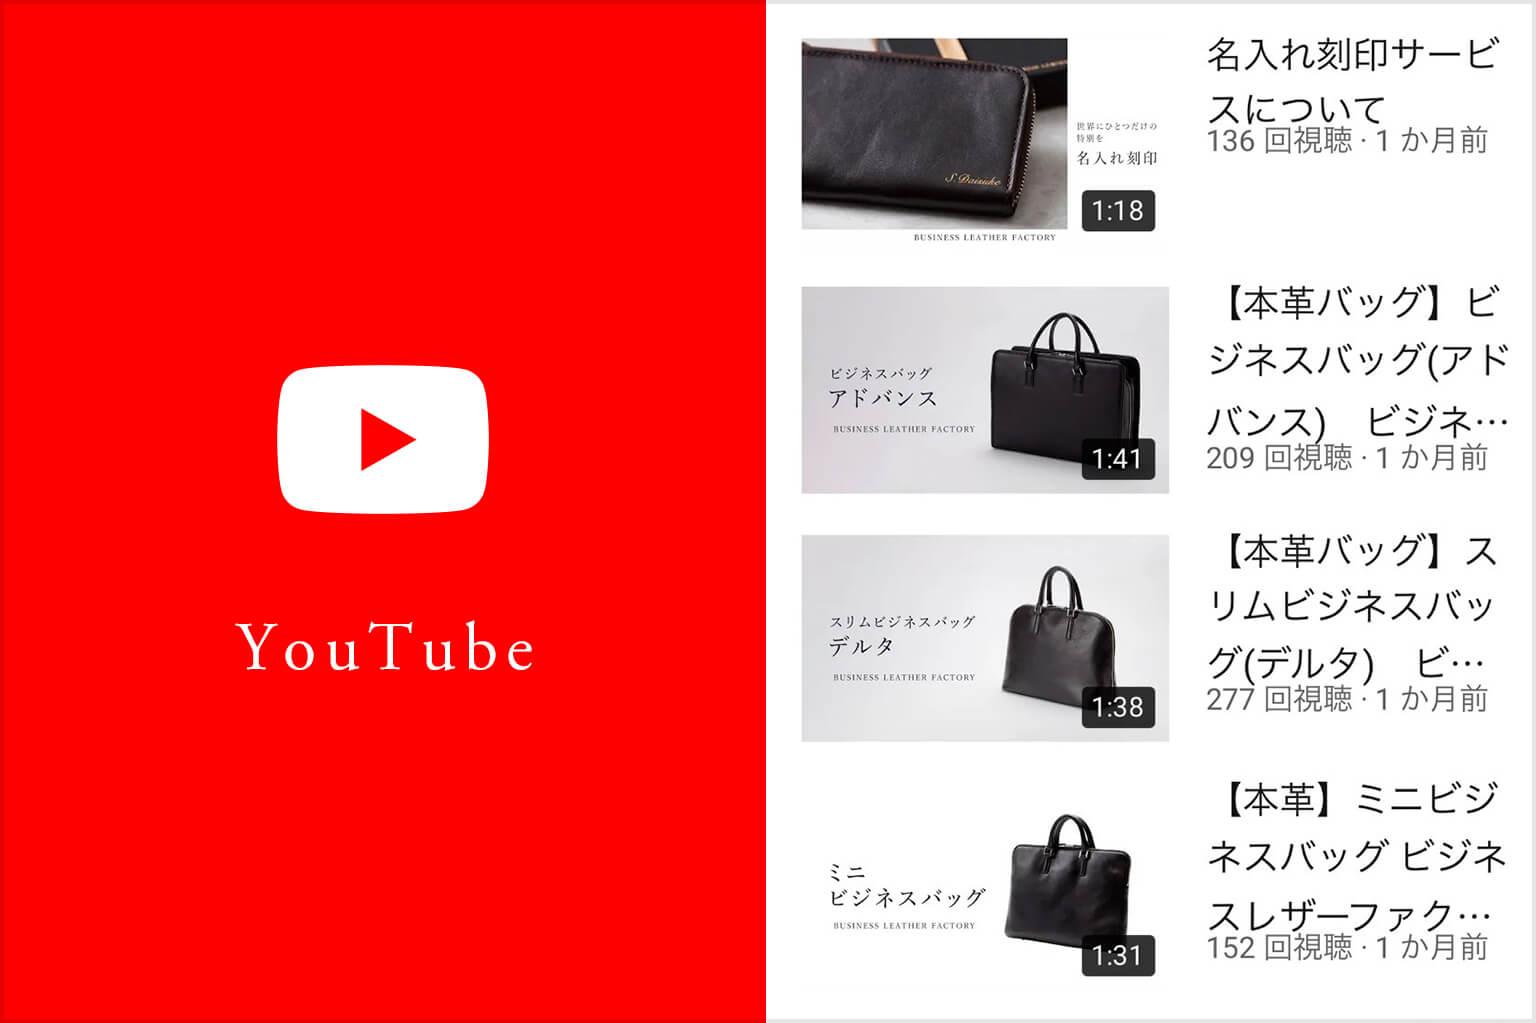 SNS YouTube